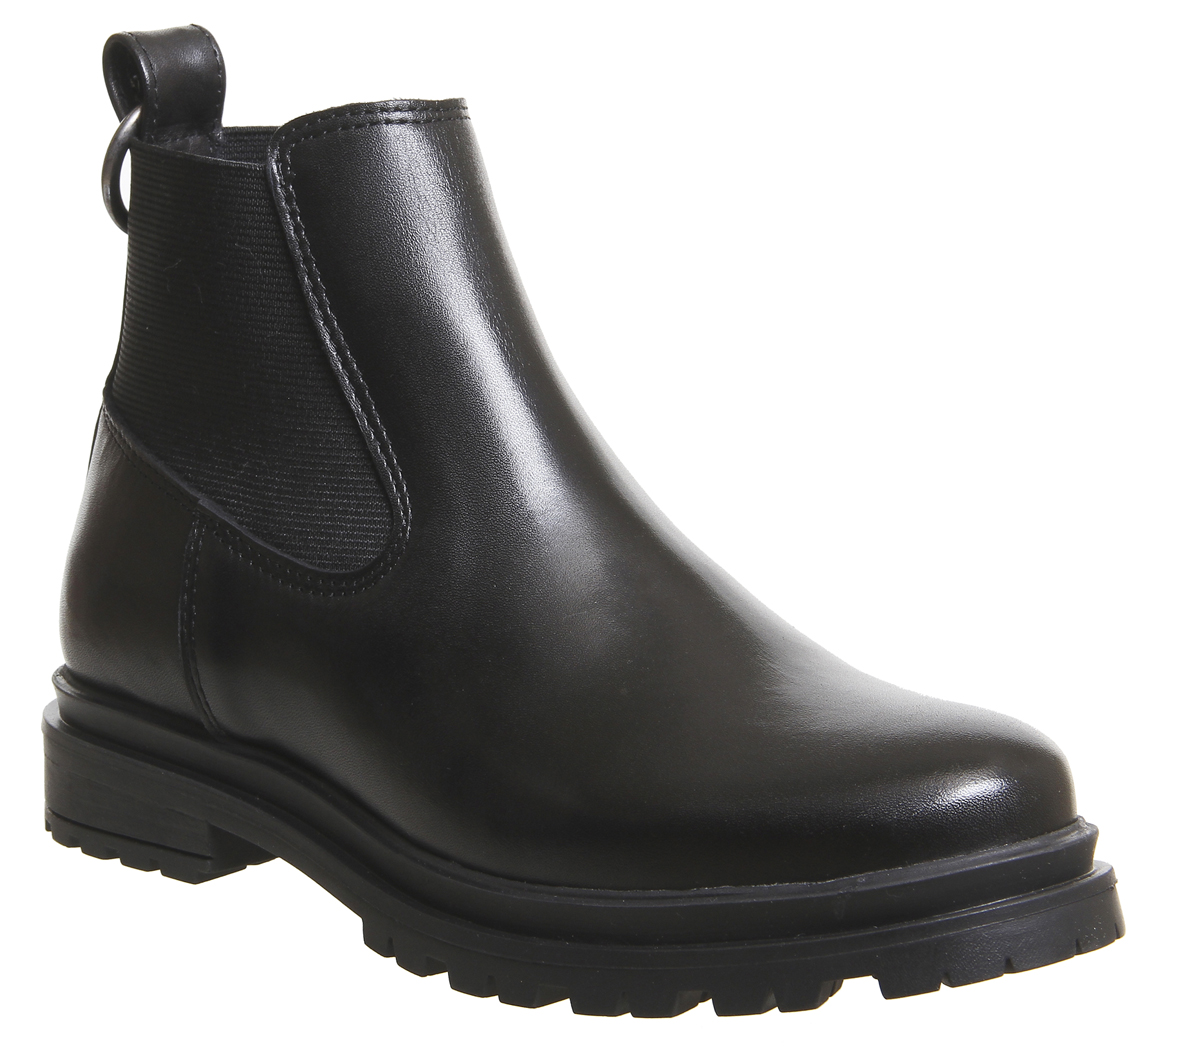 bf7ecc1b2cd420 Sentinel Womens Shoe The Bear Akira Chelsea Boots Black Leather